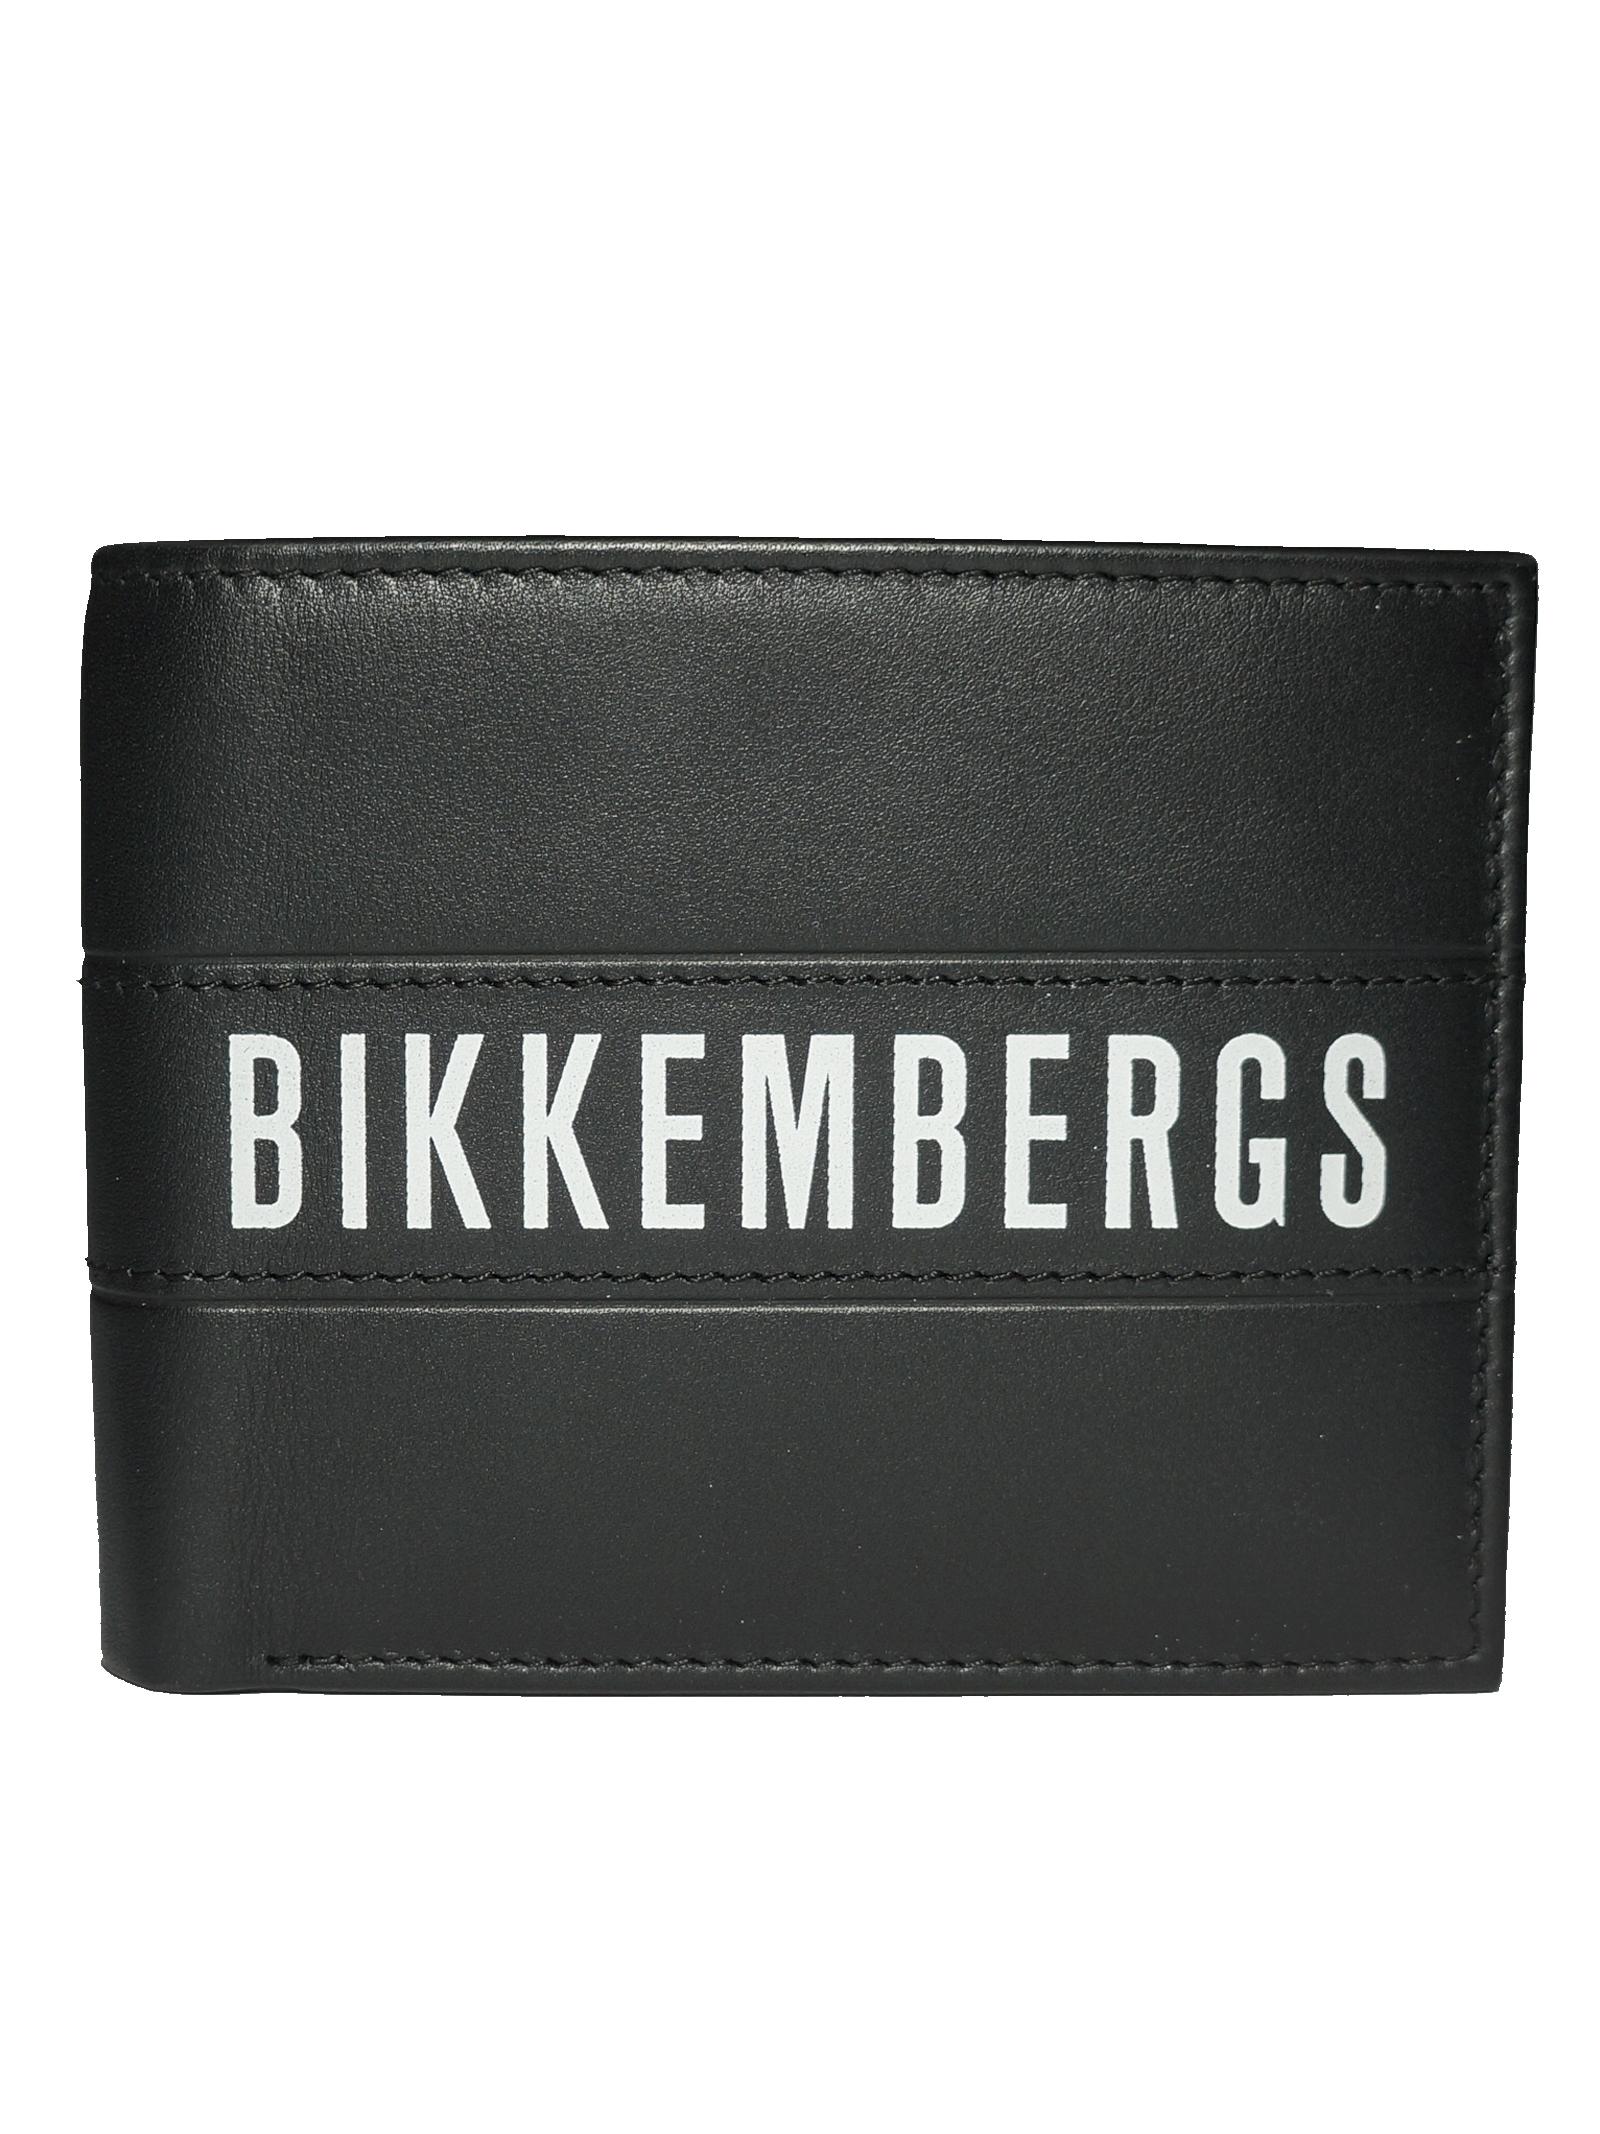 Portafogli Uomo in Pelle Bikkembergs BIKKEMBERGS | Portafogli | E2BPME1I3053D38LABELWALLET305